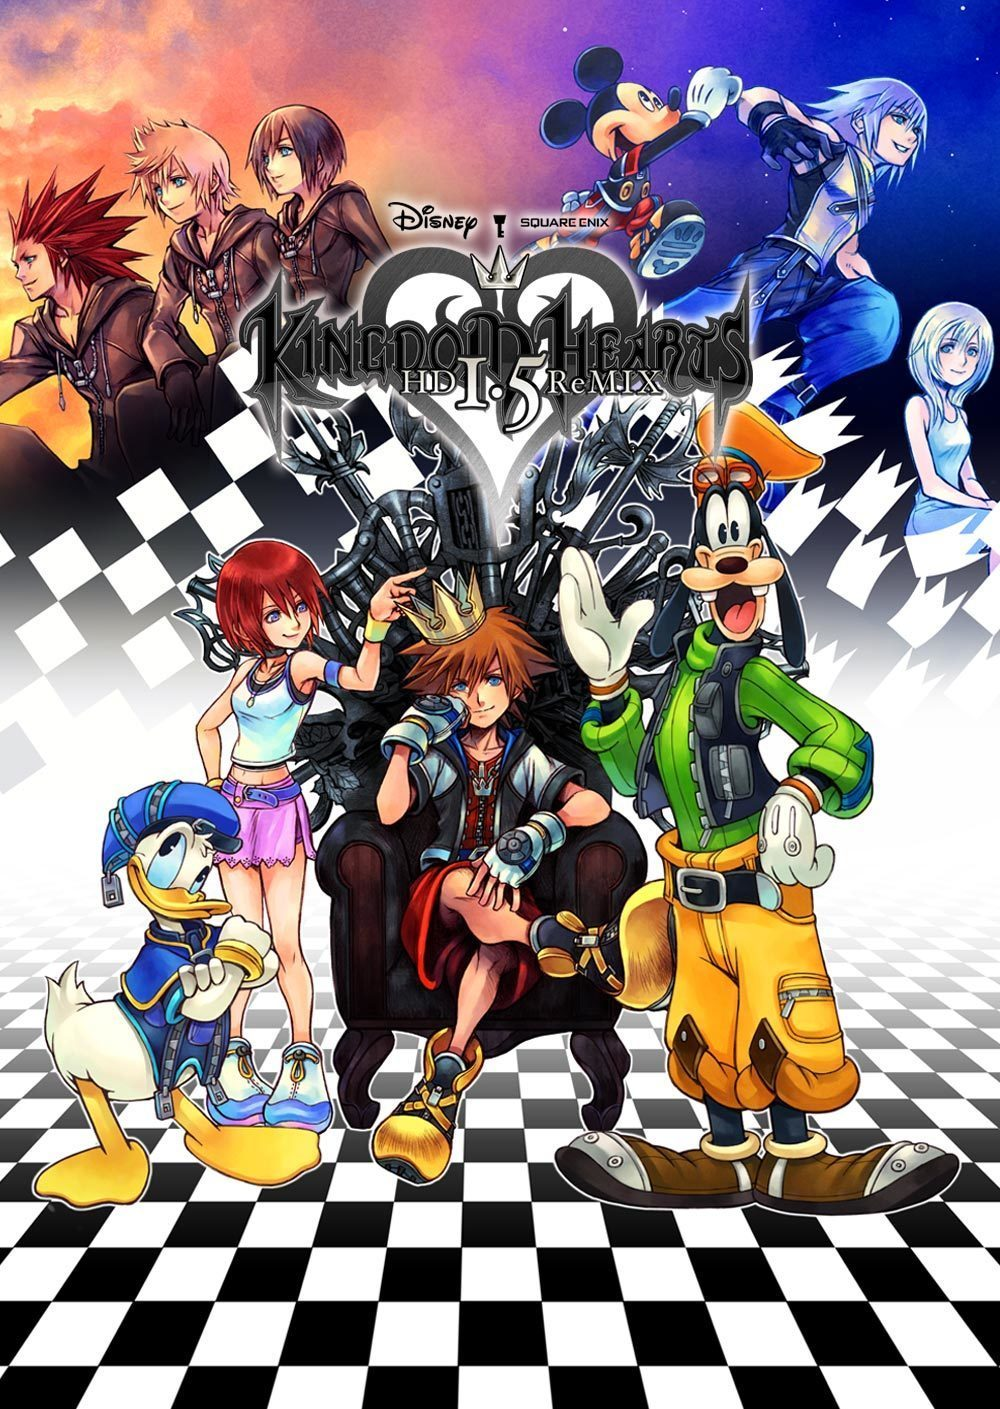 Kingdom Hearts HD 1.5 Remix (Video Game 2013) - IMDb